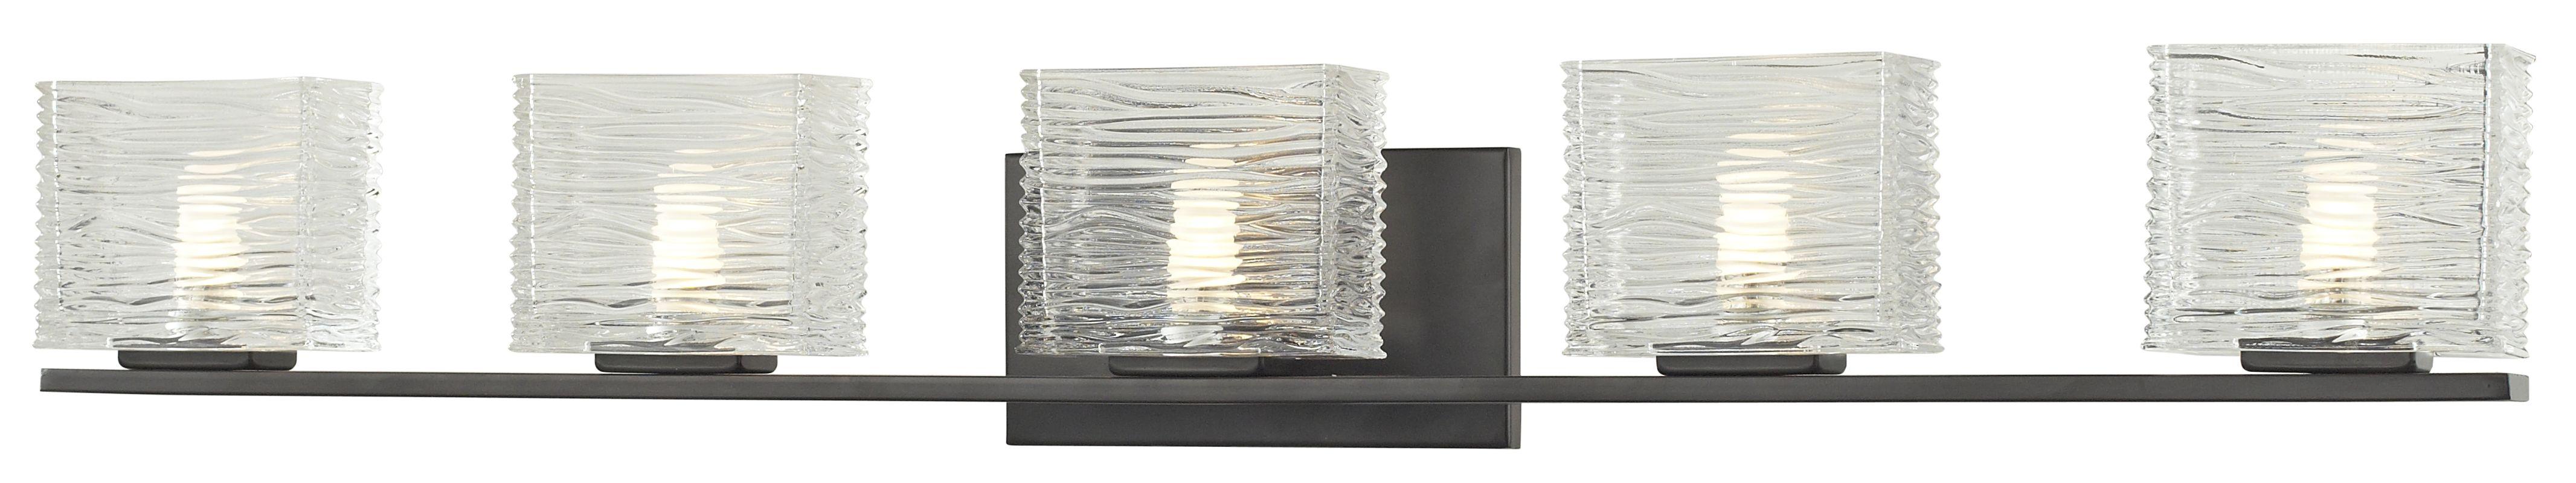 Z-Lite 3026-5V Jaol 5 Light ADA Compliant Bathroom Vanity Light with